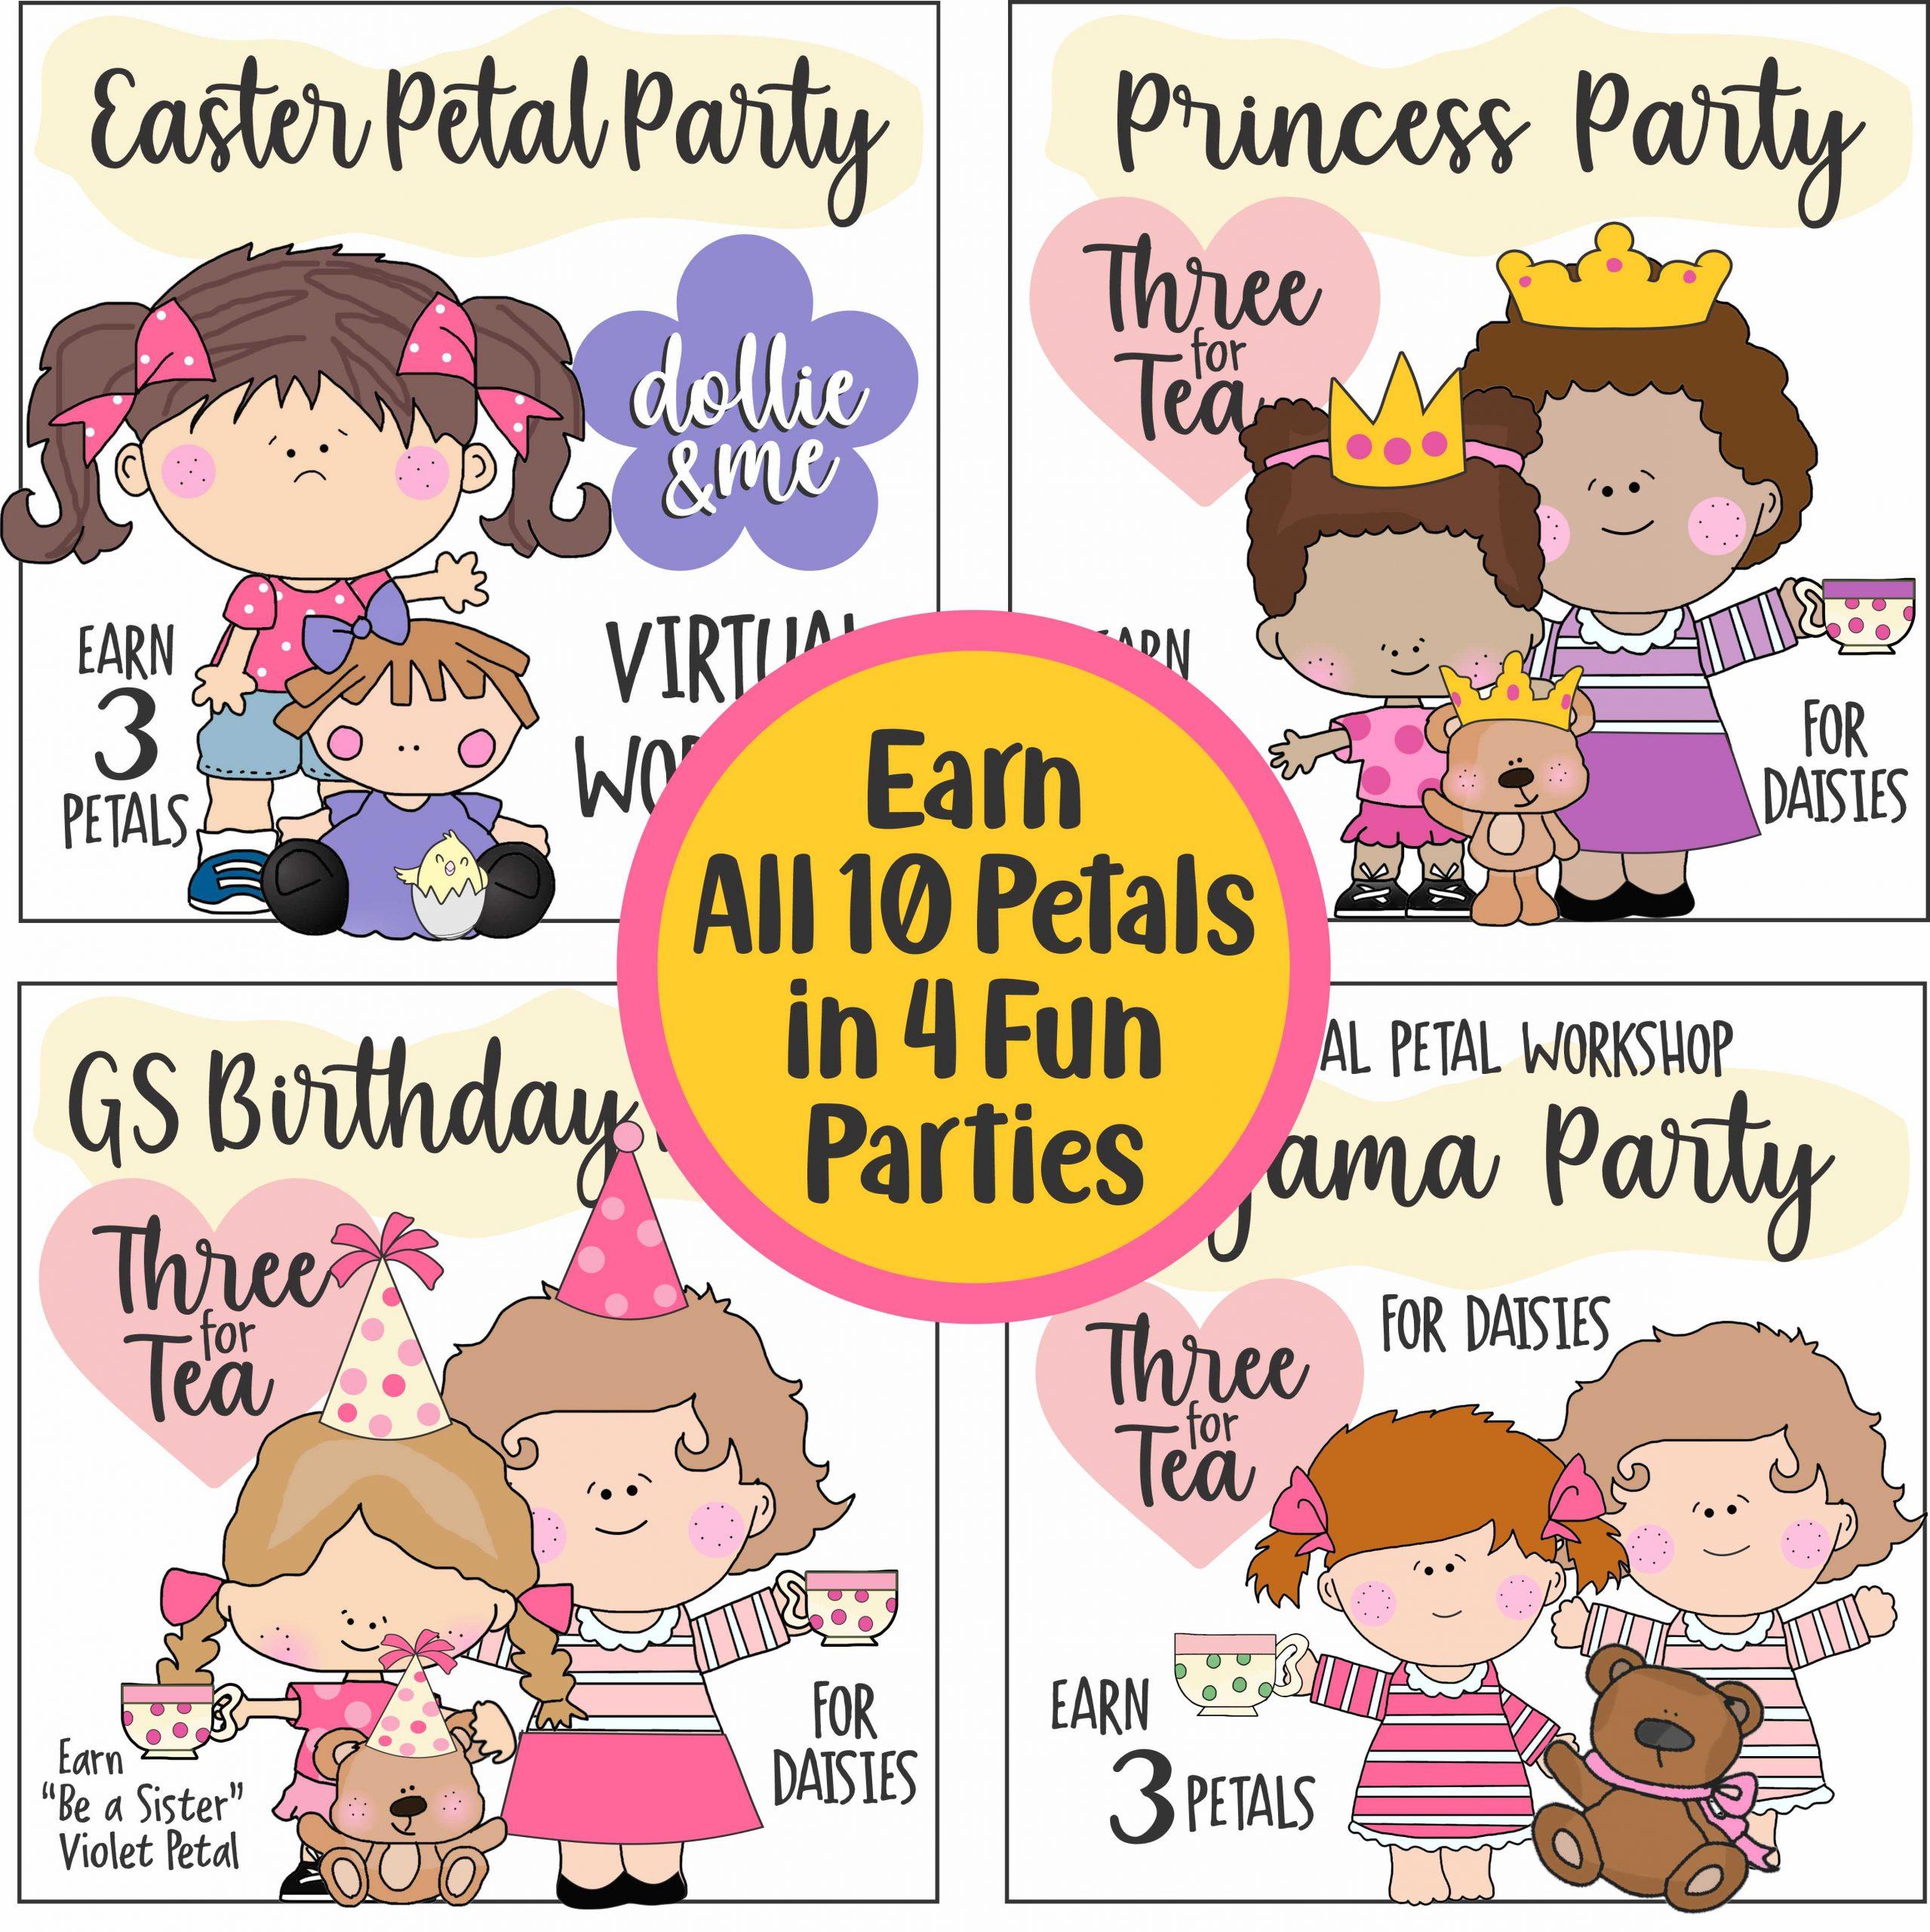 Daisy Tea Parties for Petals